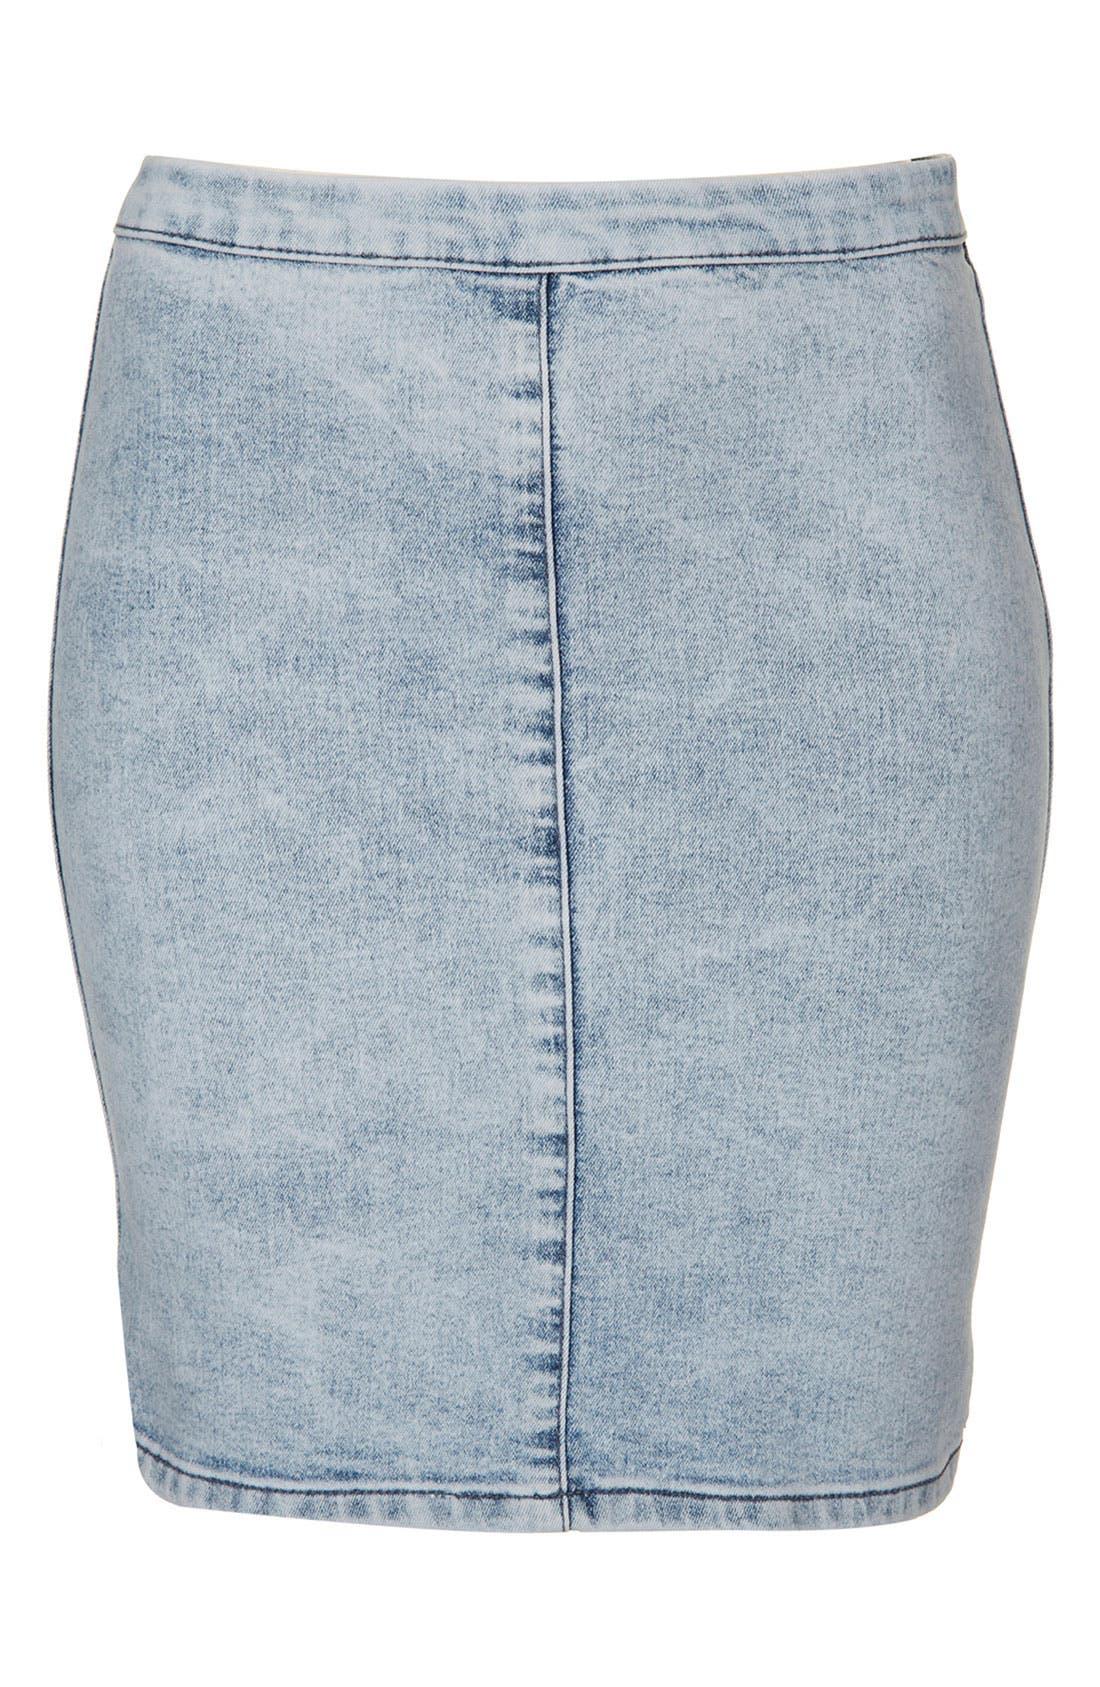 Alternate Image 1 Selected - Topshop Moto 'Joni' Denim Skirt